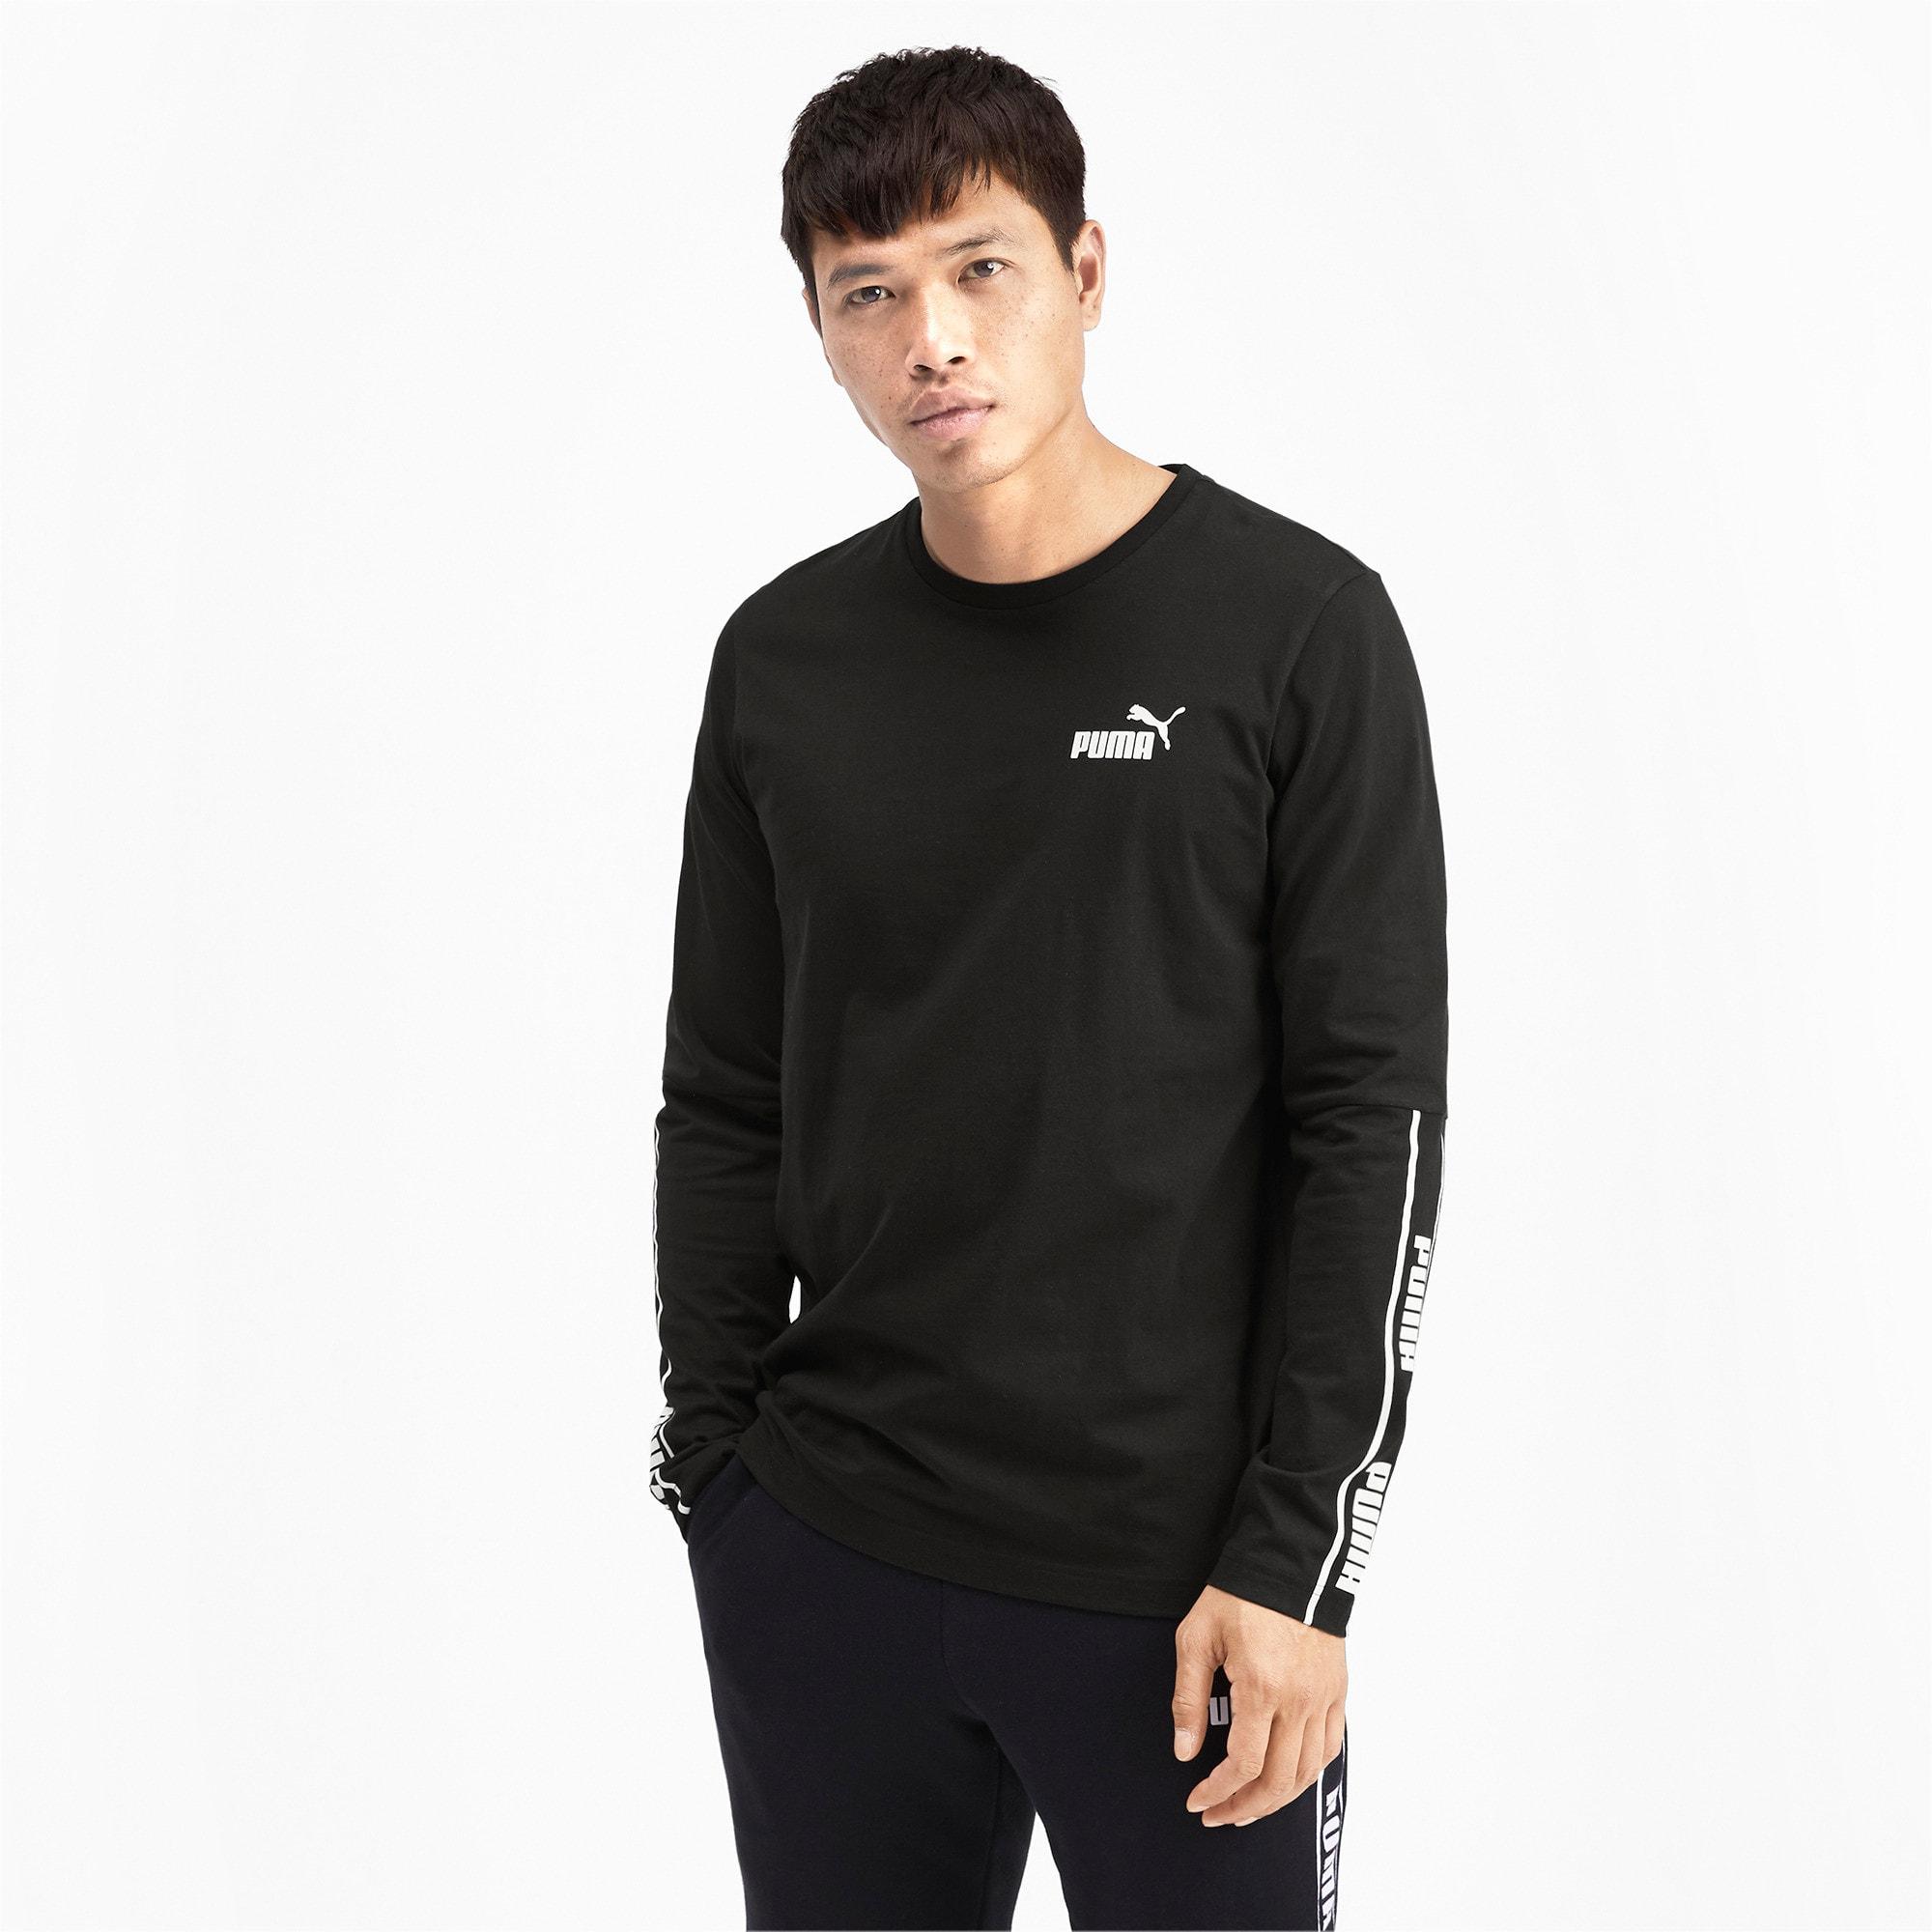 Miniatura 2 de Camiseta de mangas largas Amplified para hombre, Puma Black, mediano